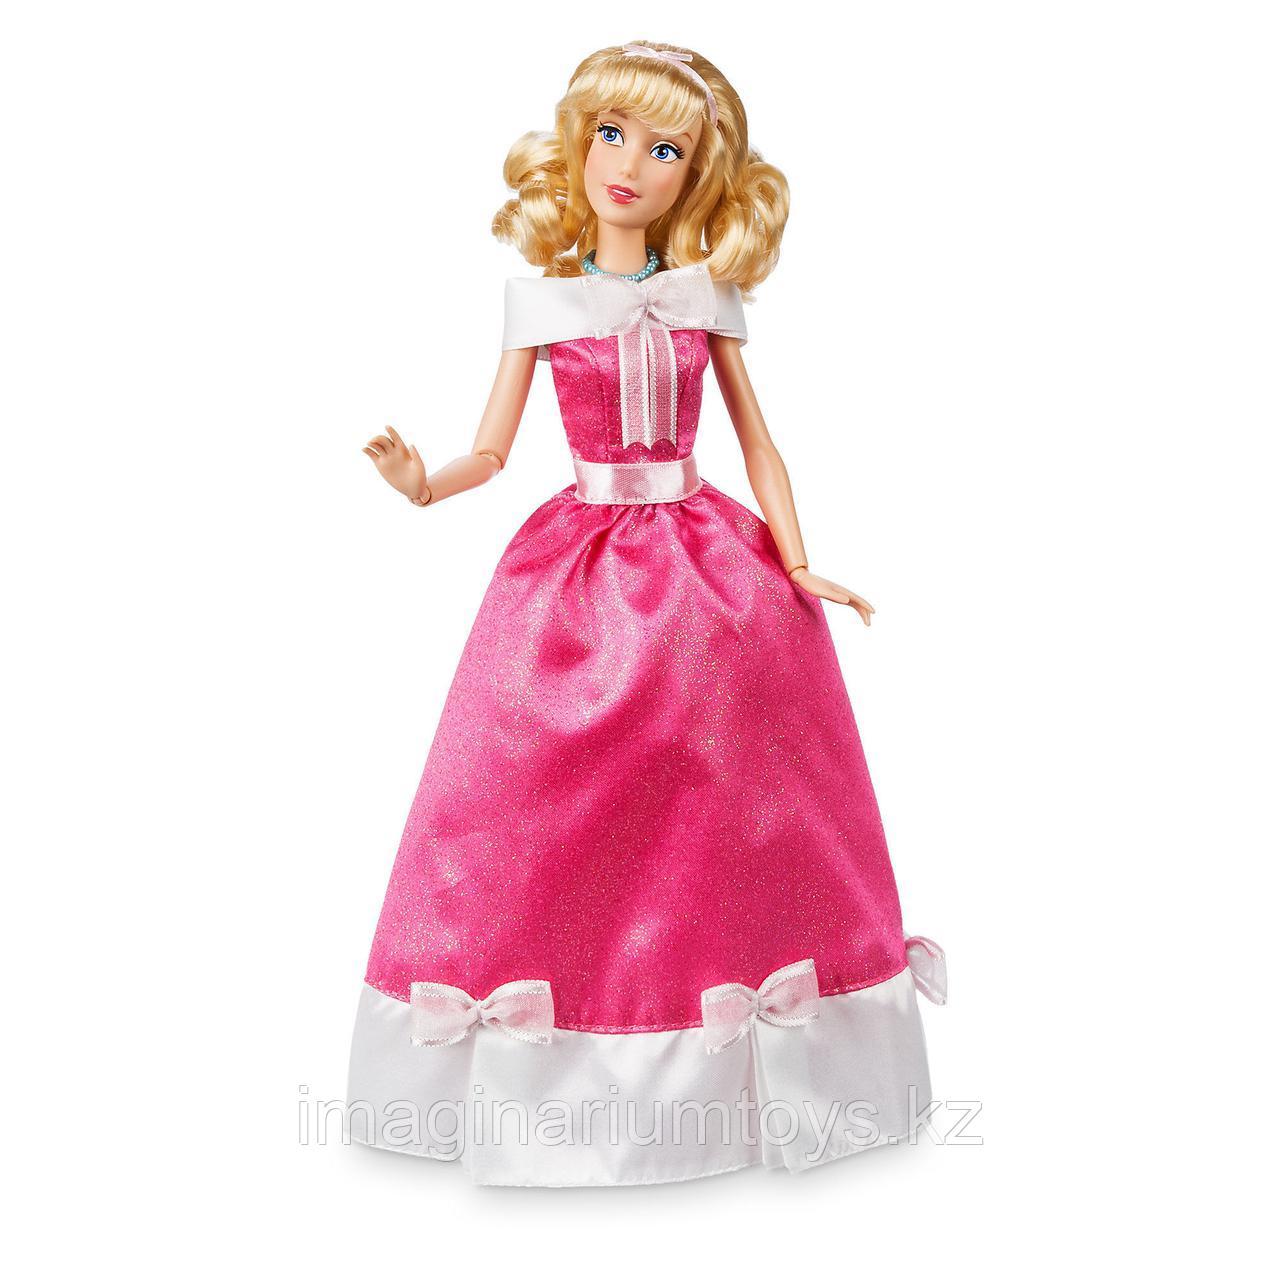 Кукла поющая Золушка Disney